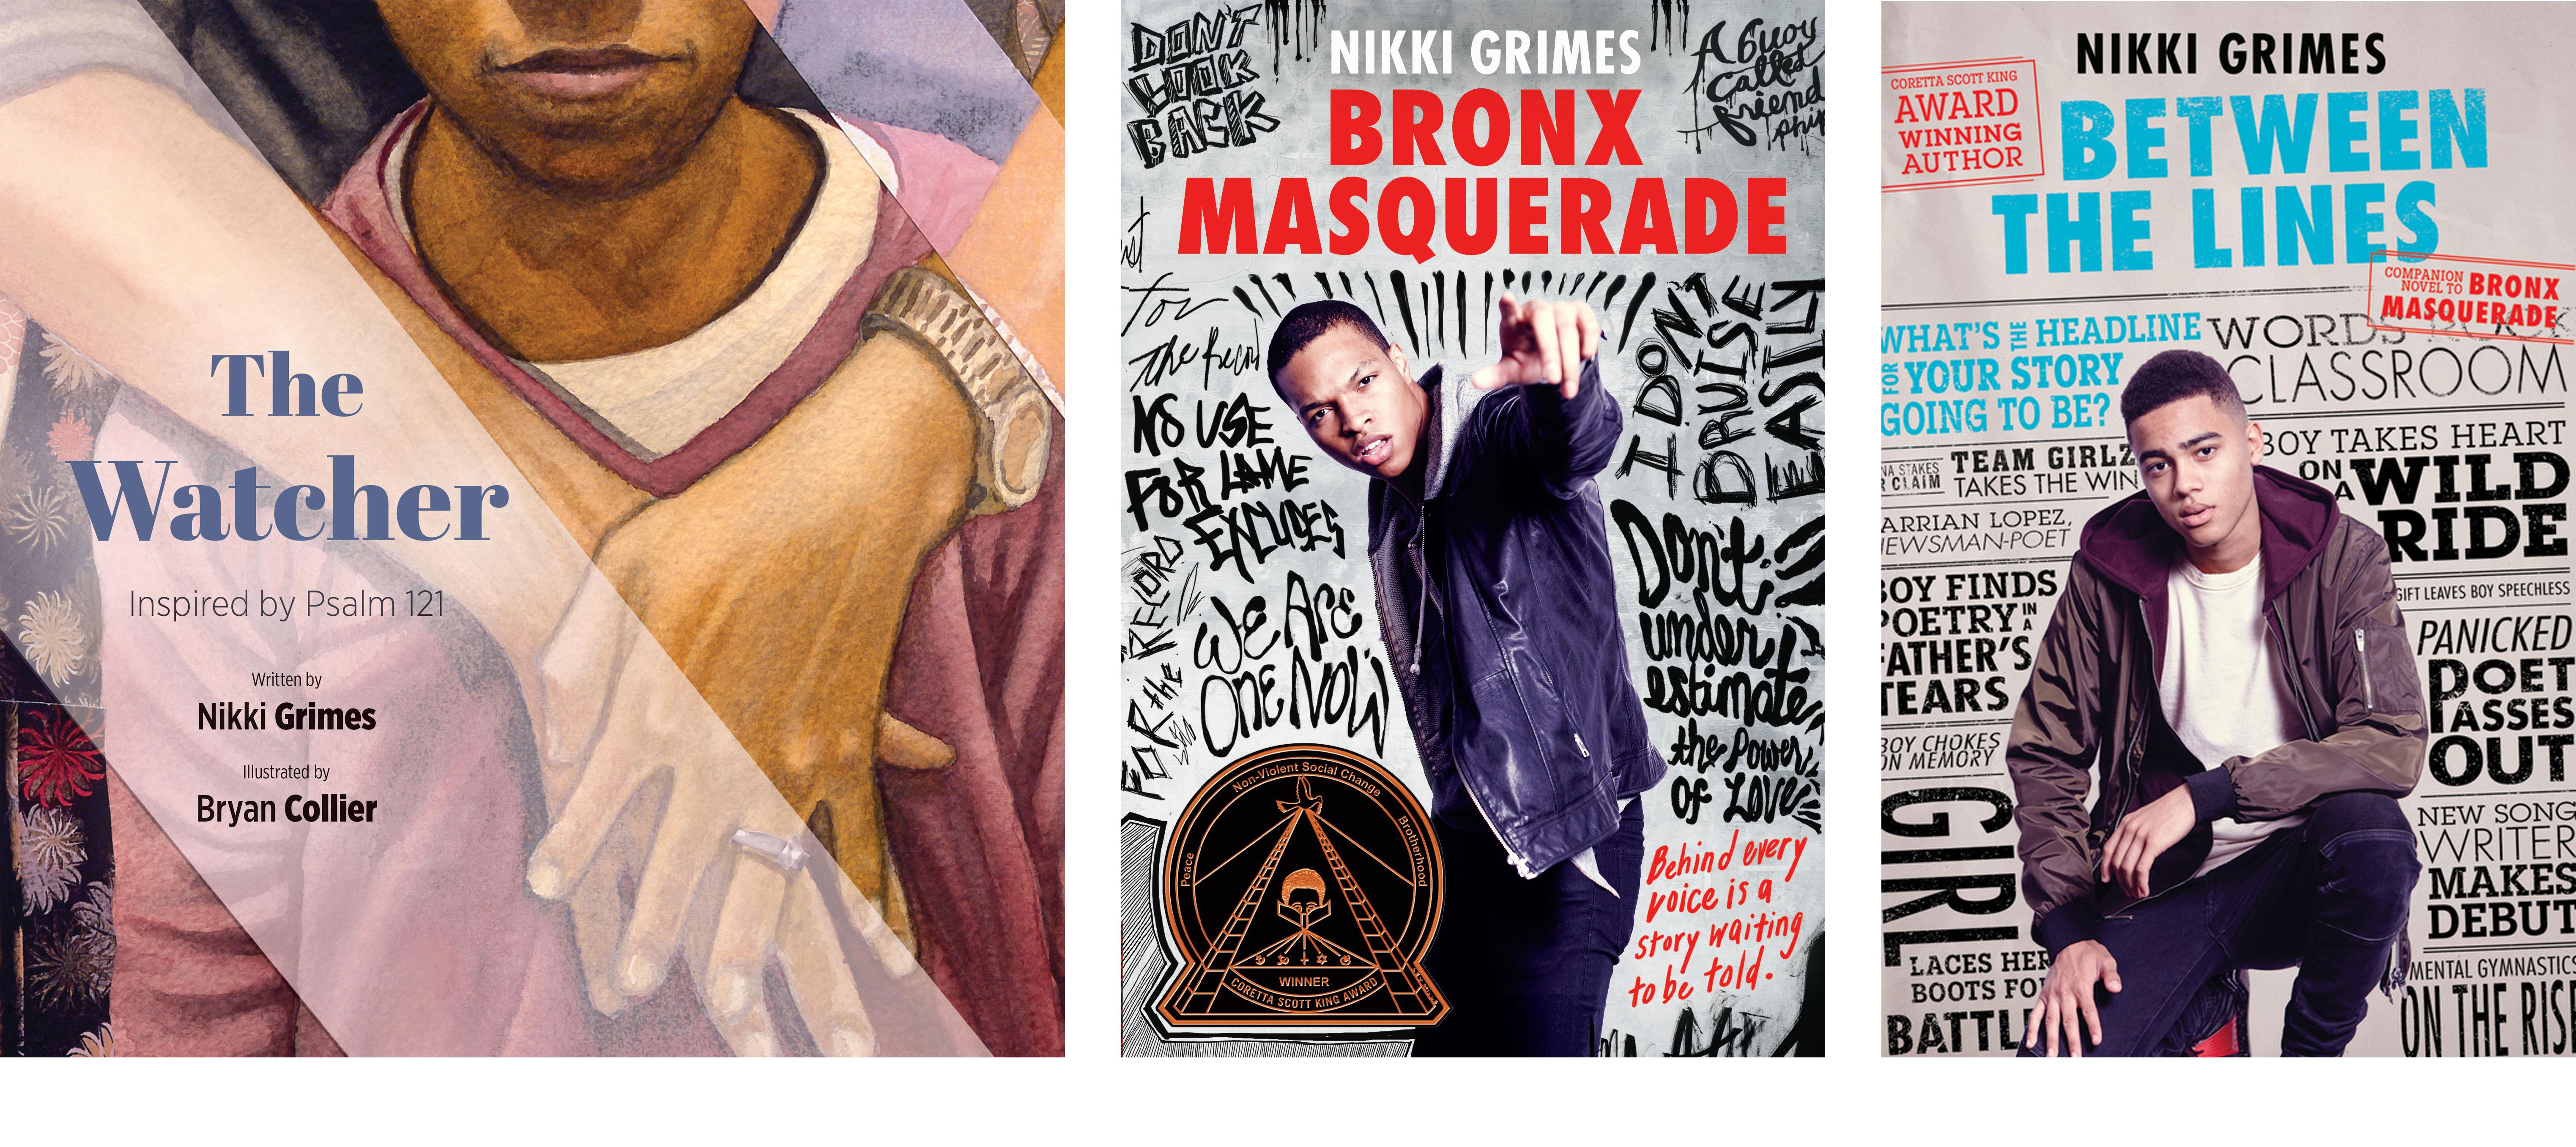 BronxMasq_PB_CVR_release.indd